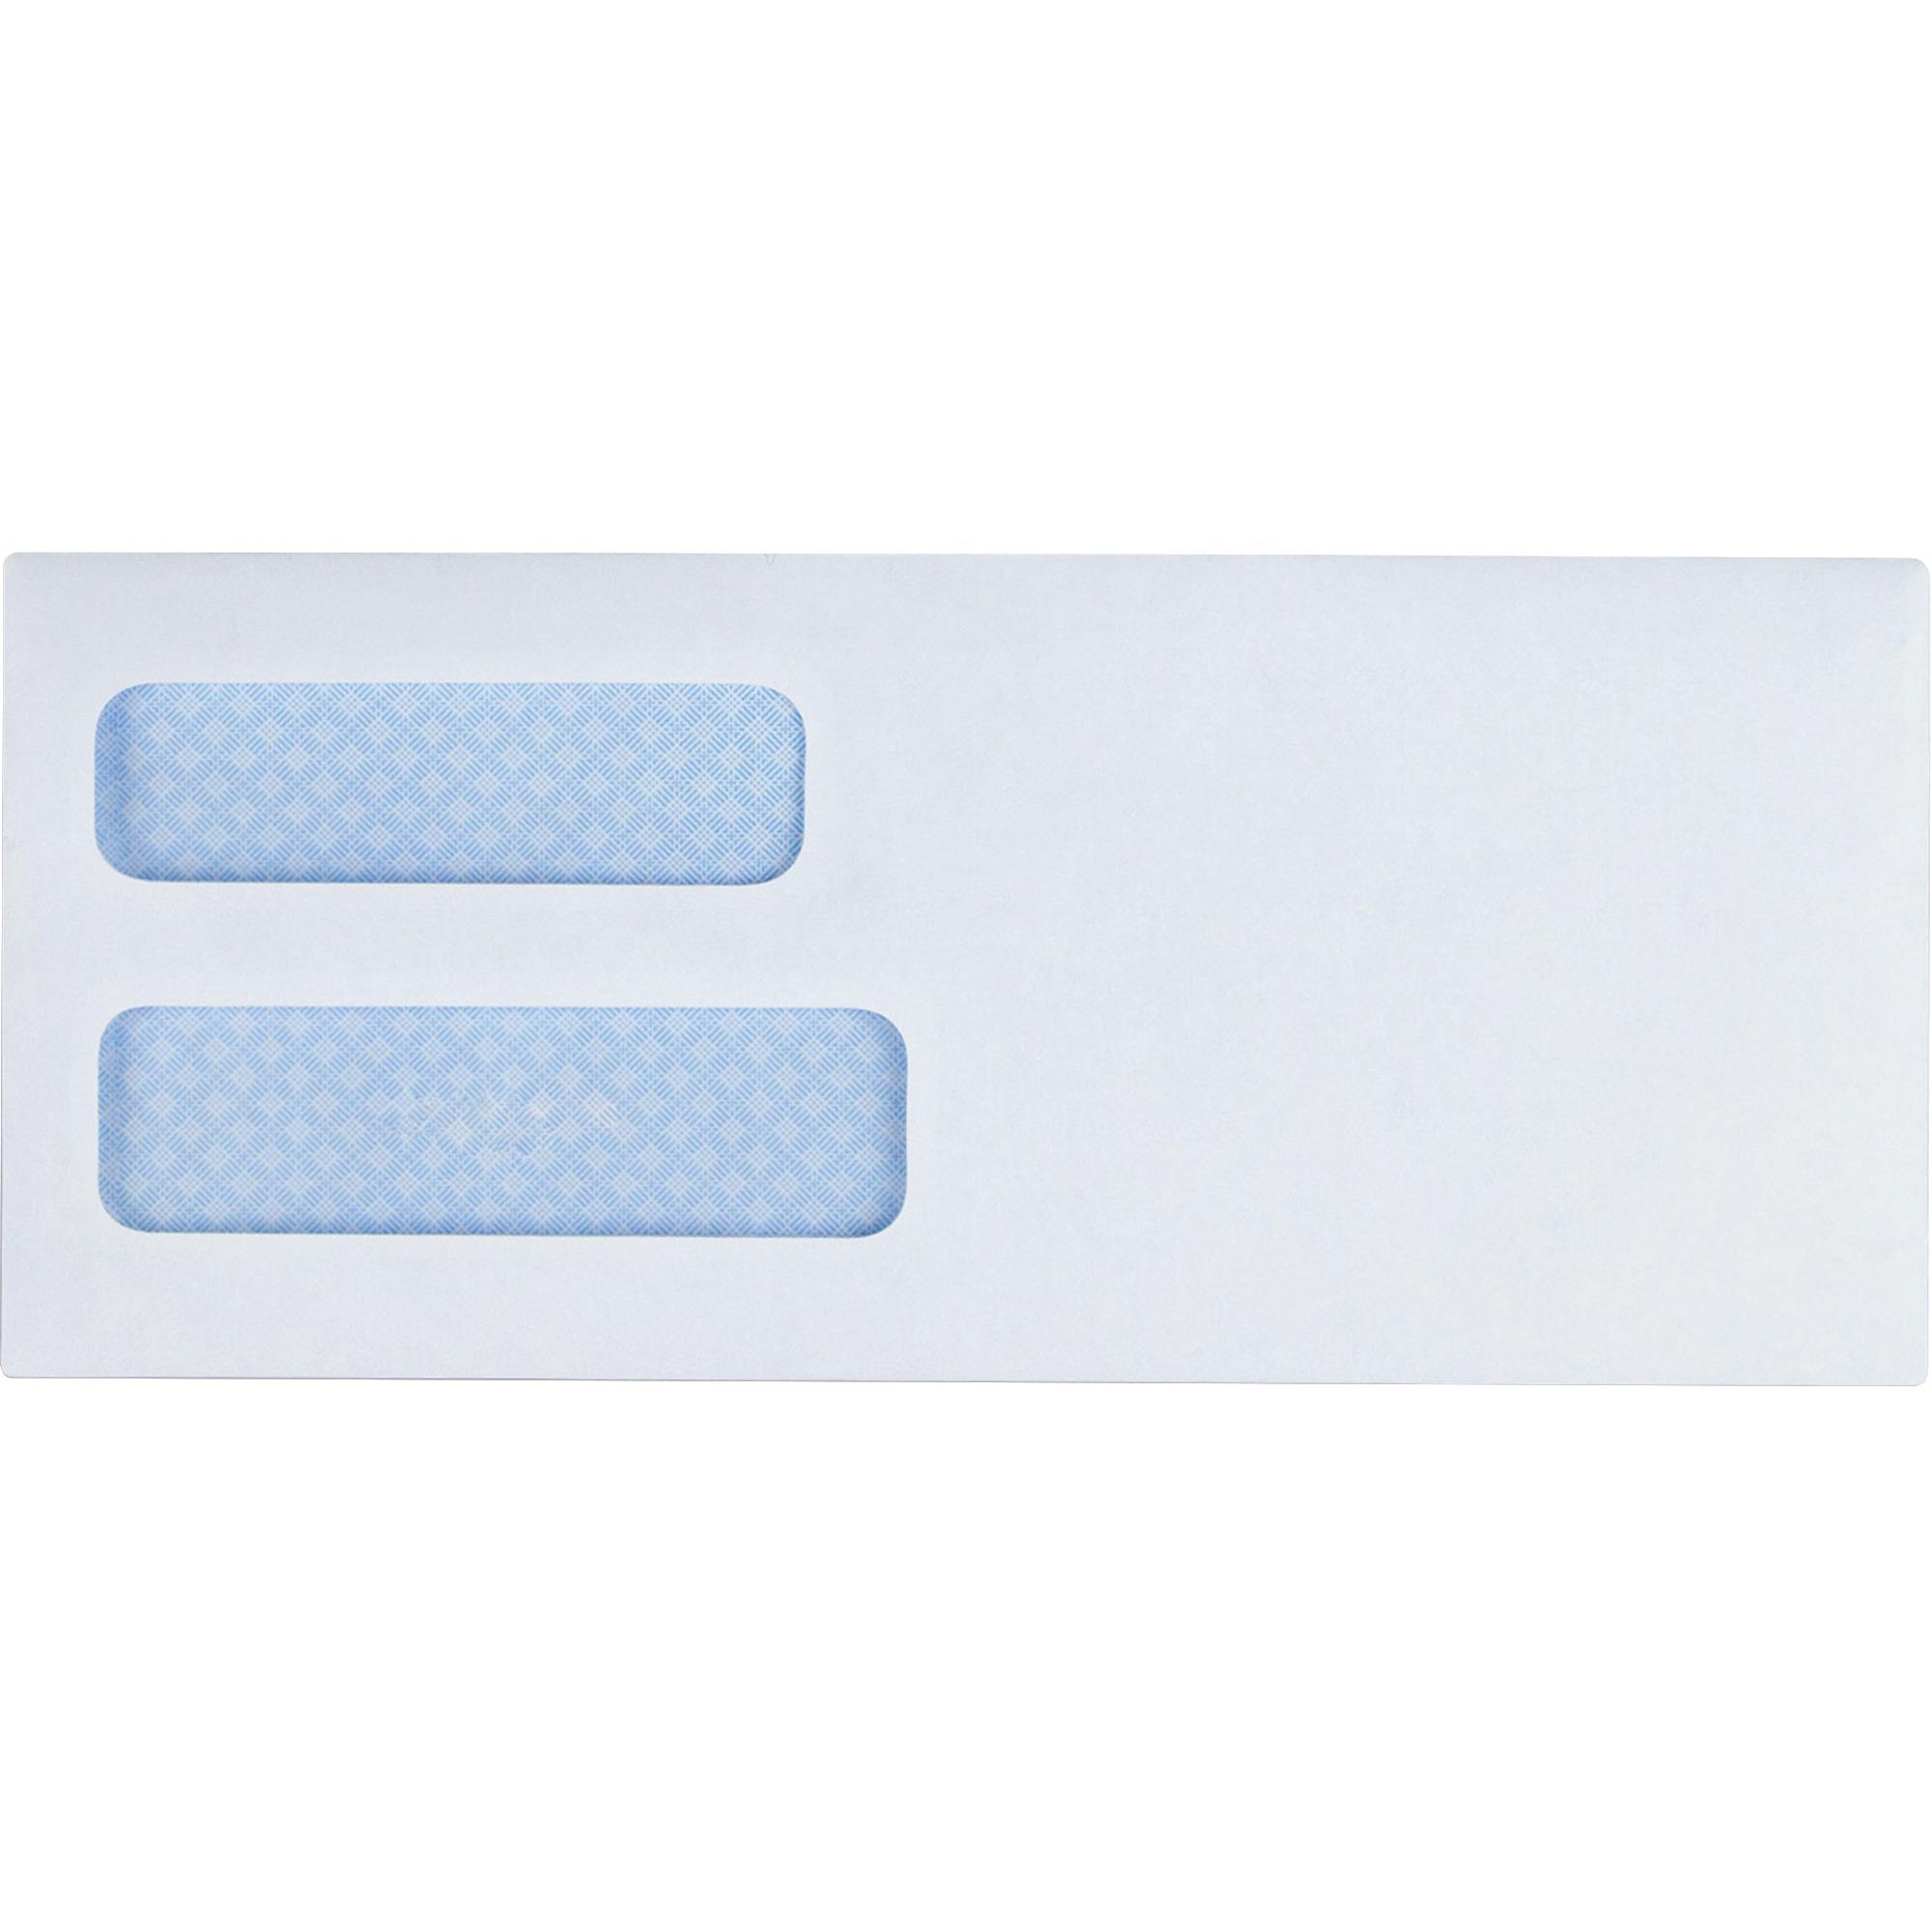 Home office supplies envelopes forms envelopes for Envelope house